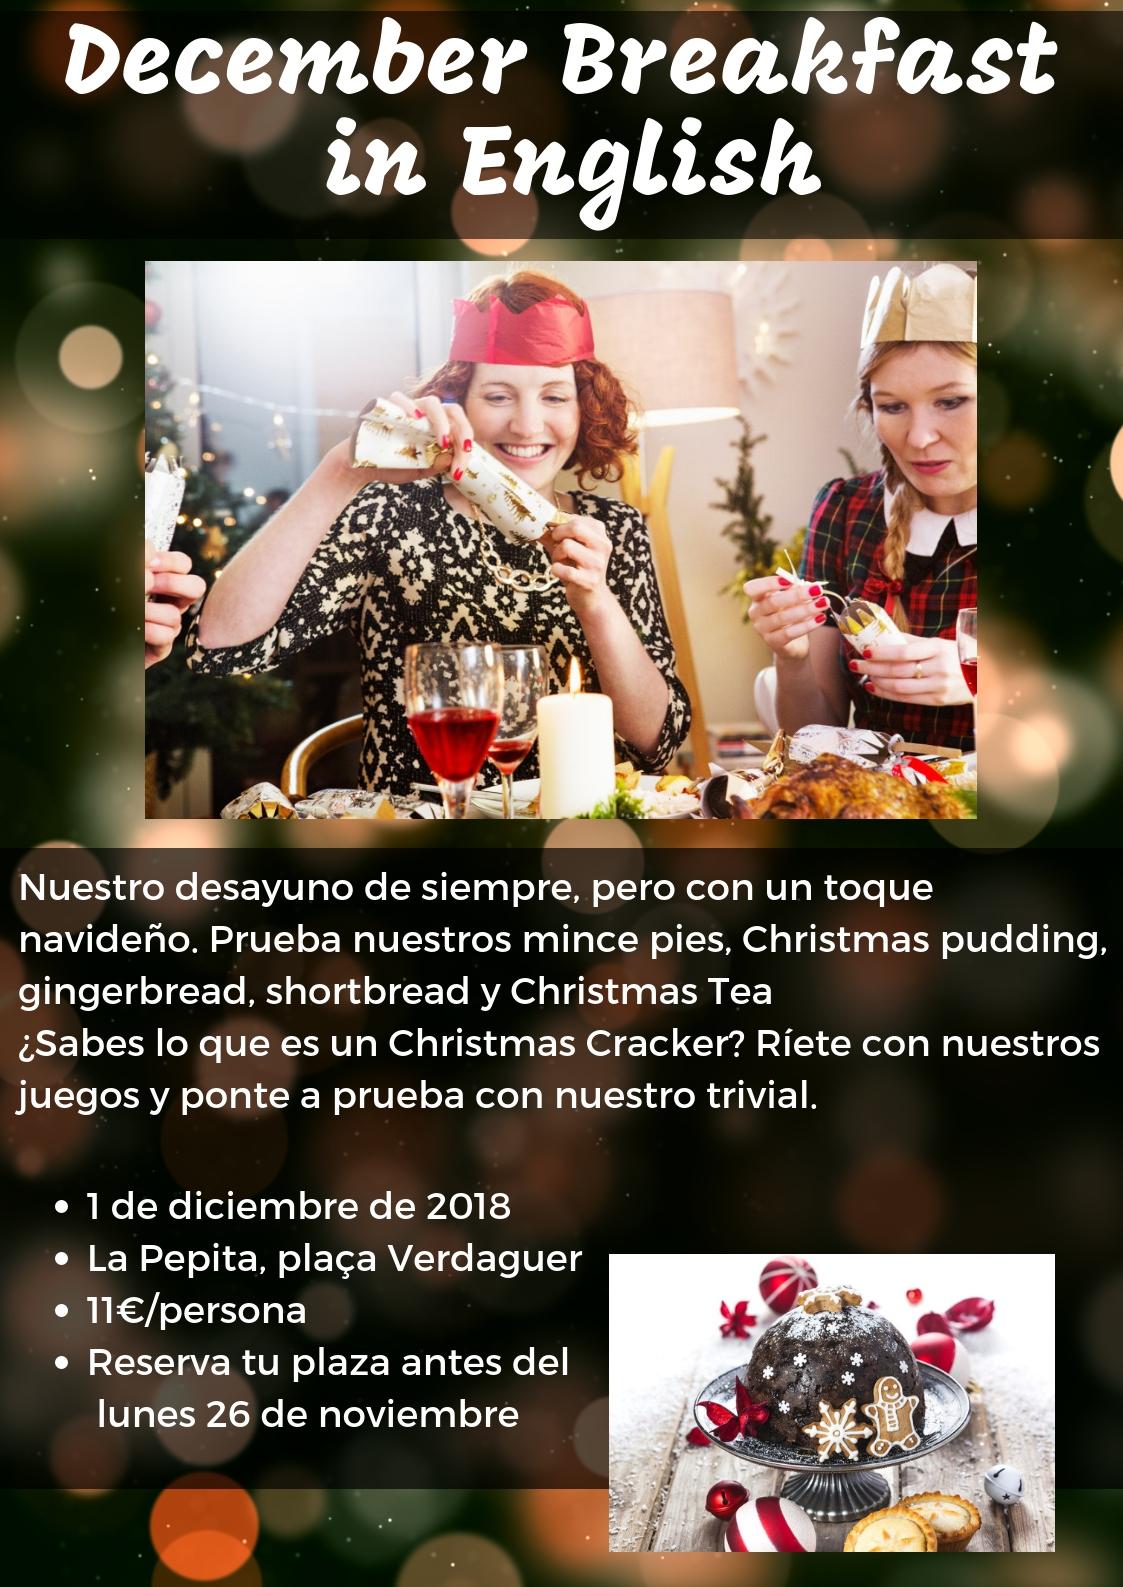 Christmas Breakfast in English!